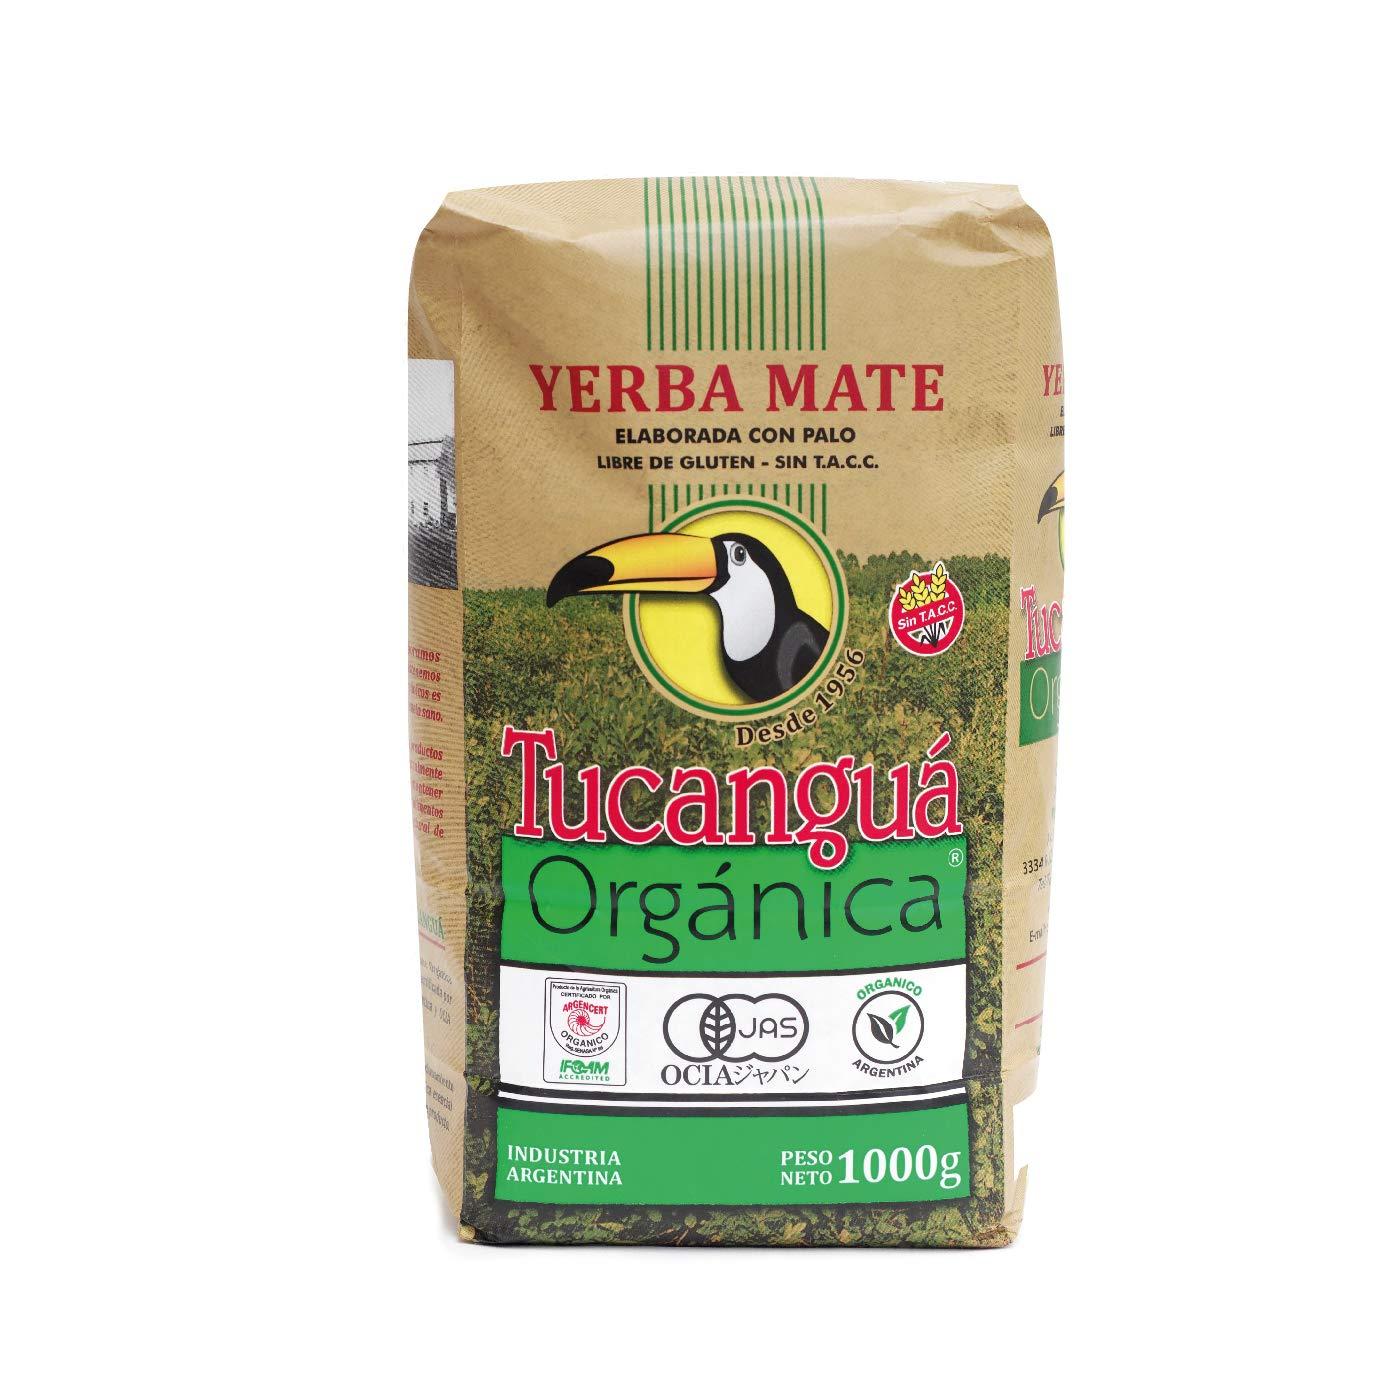 Tucanguá Organic Yerba Mate Loose Leaf Tea Traditional South American Tea Drink 2.2 lb 1 kg